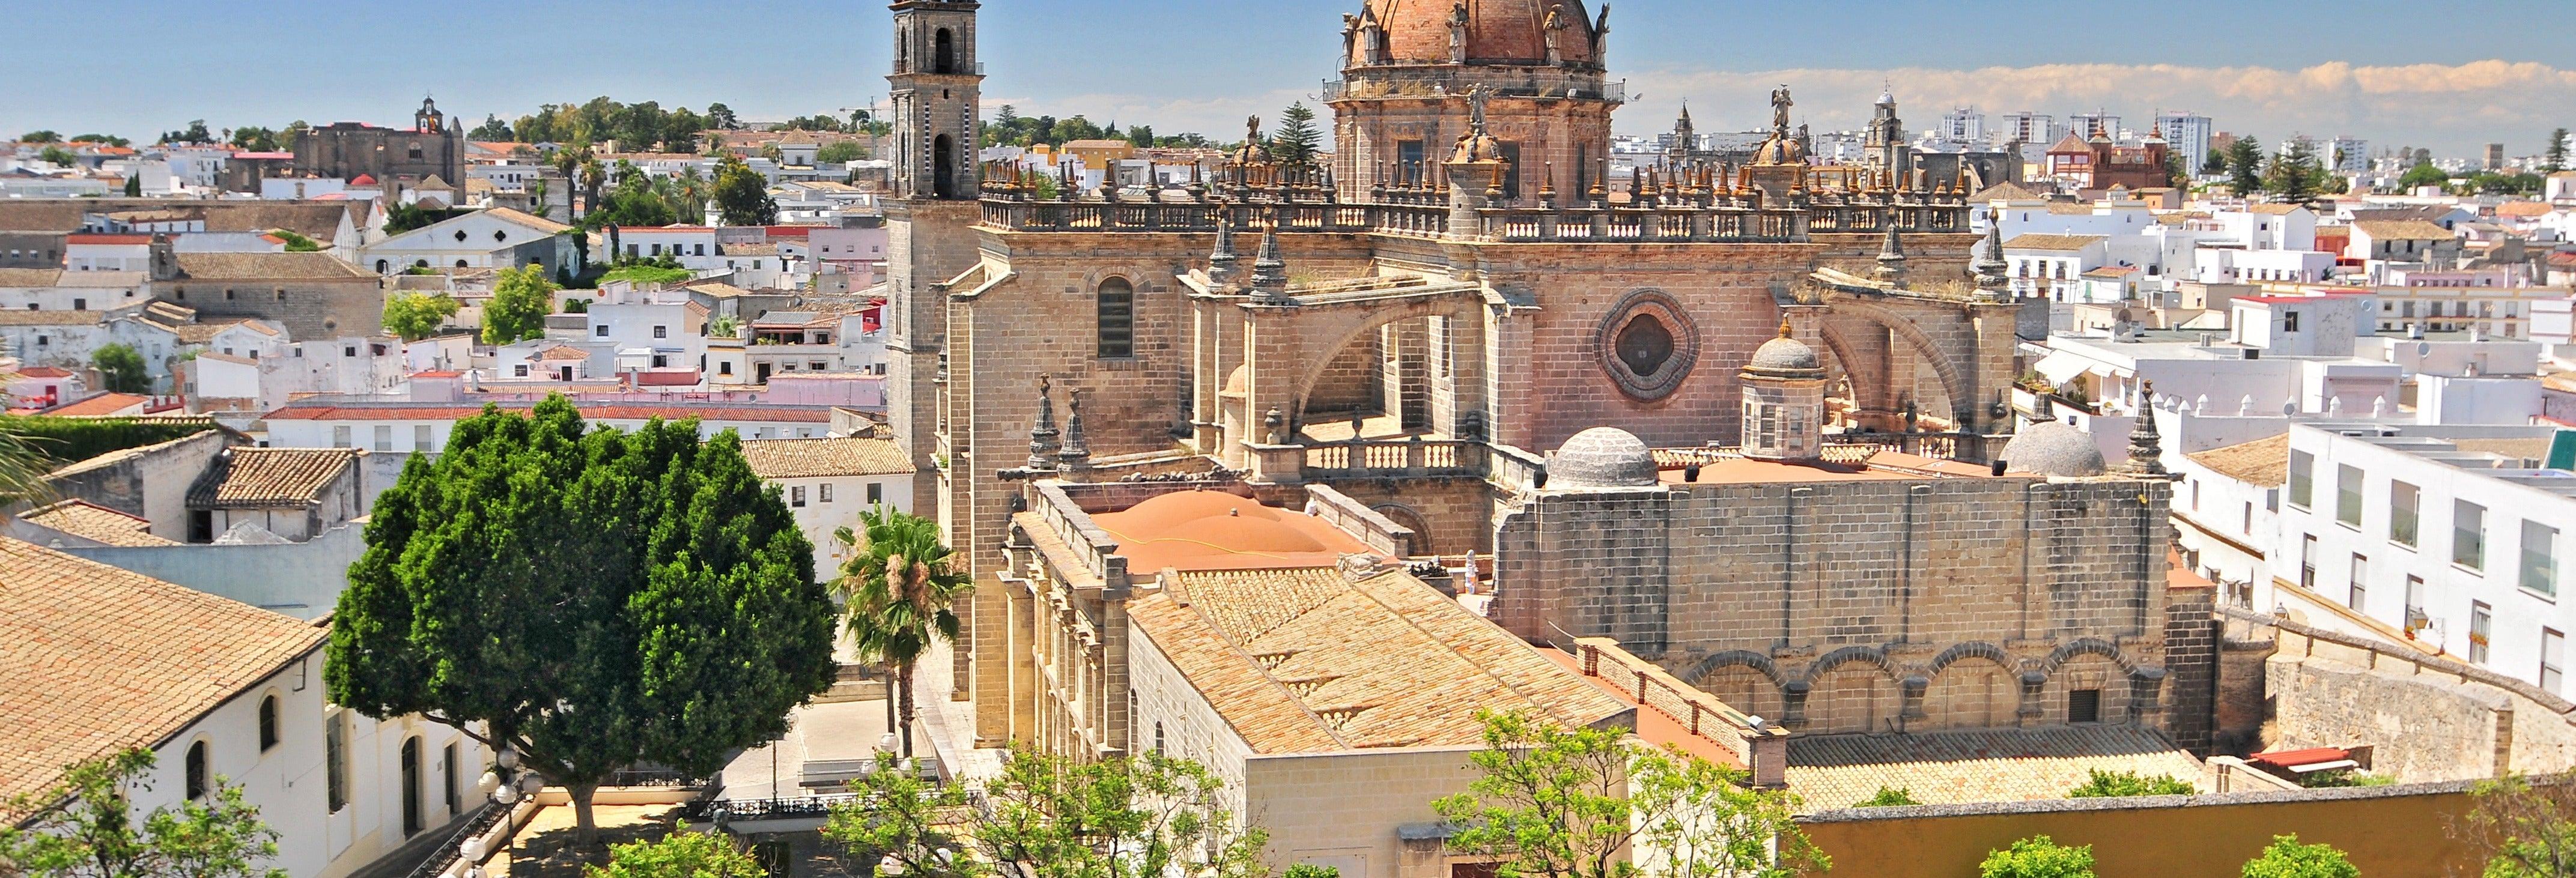 Excursão a Jerez de la Frontera